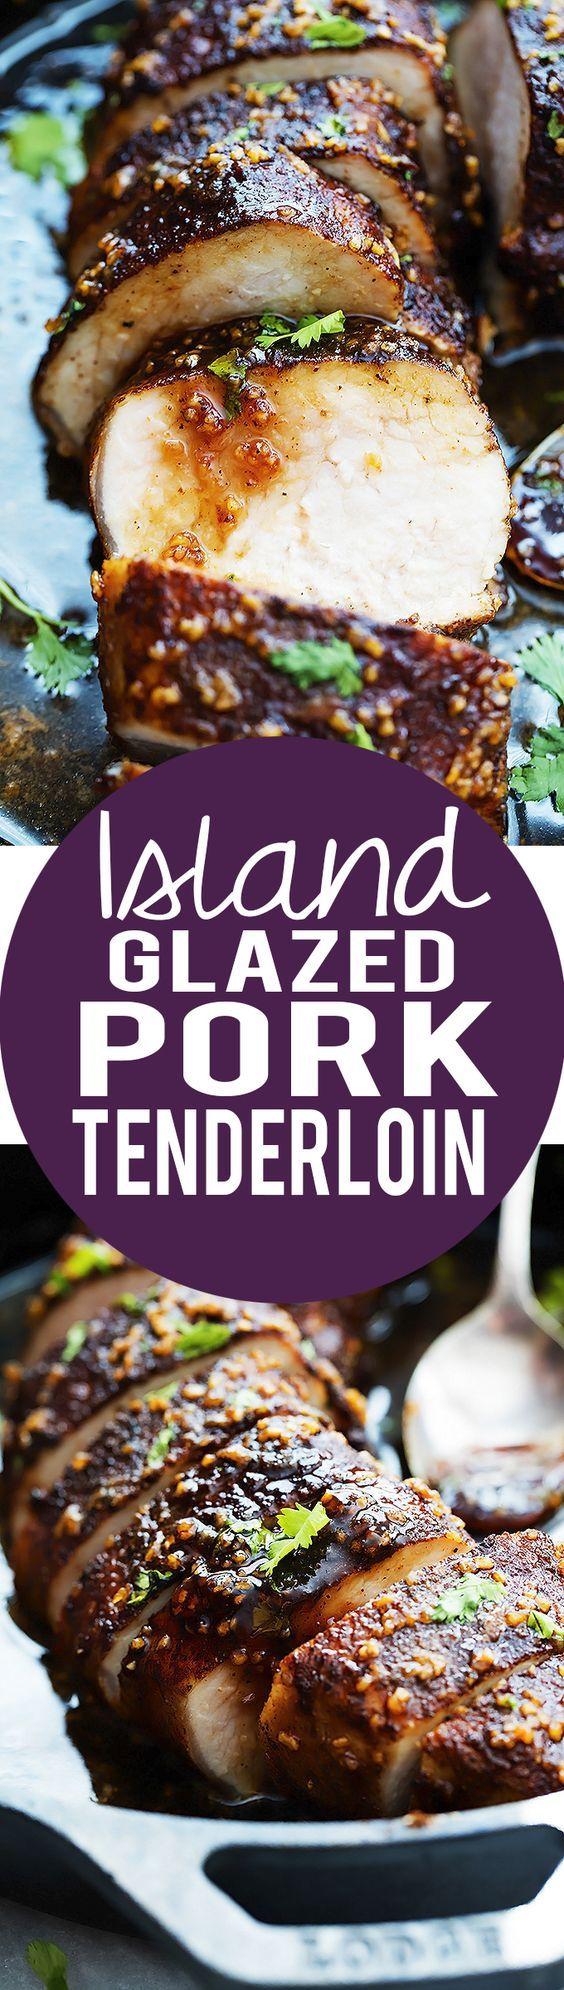 30-minute Island Glazed Pork Tenderloin | Creme de la Crumb: